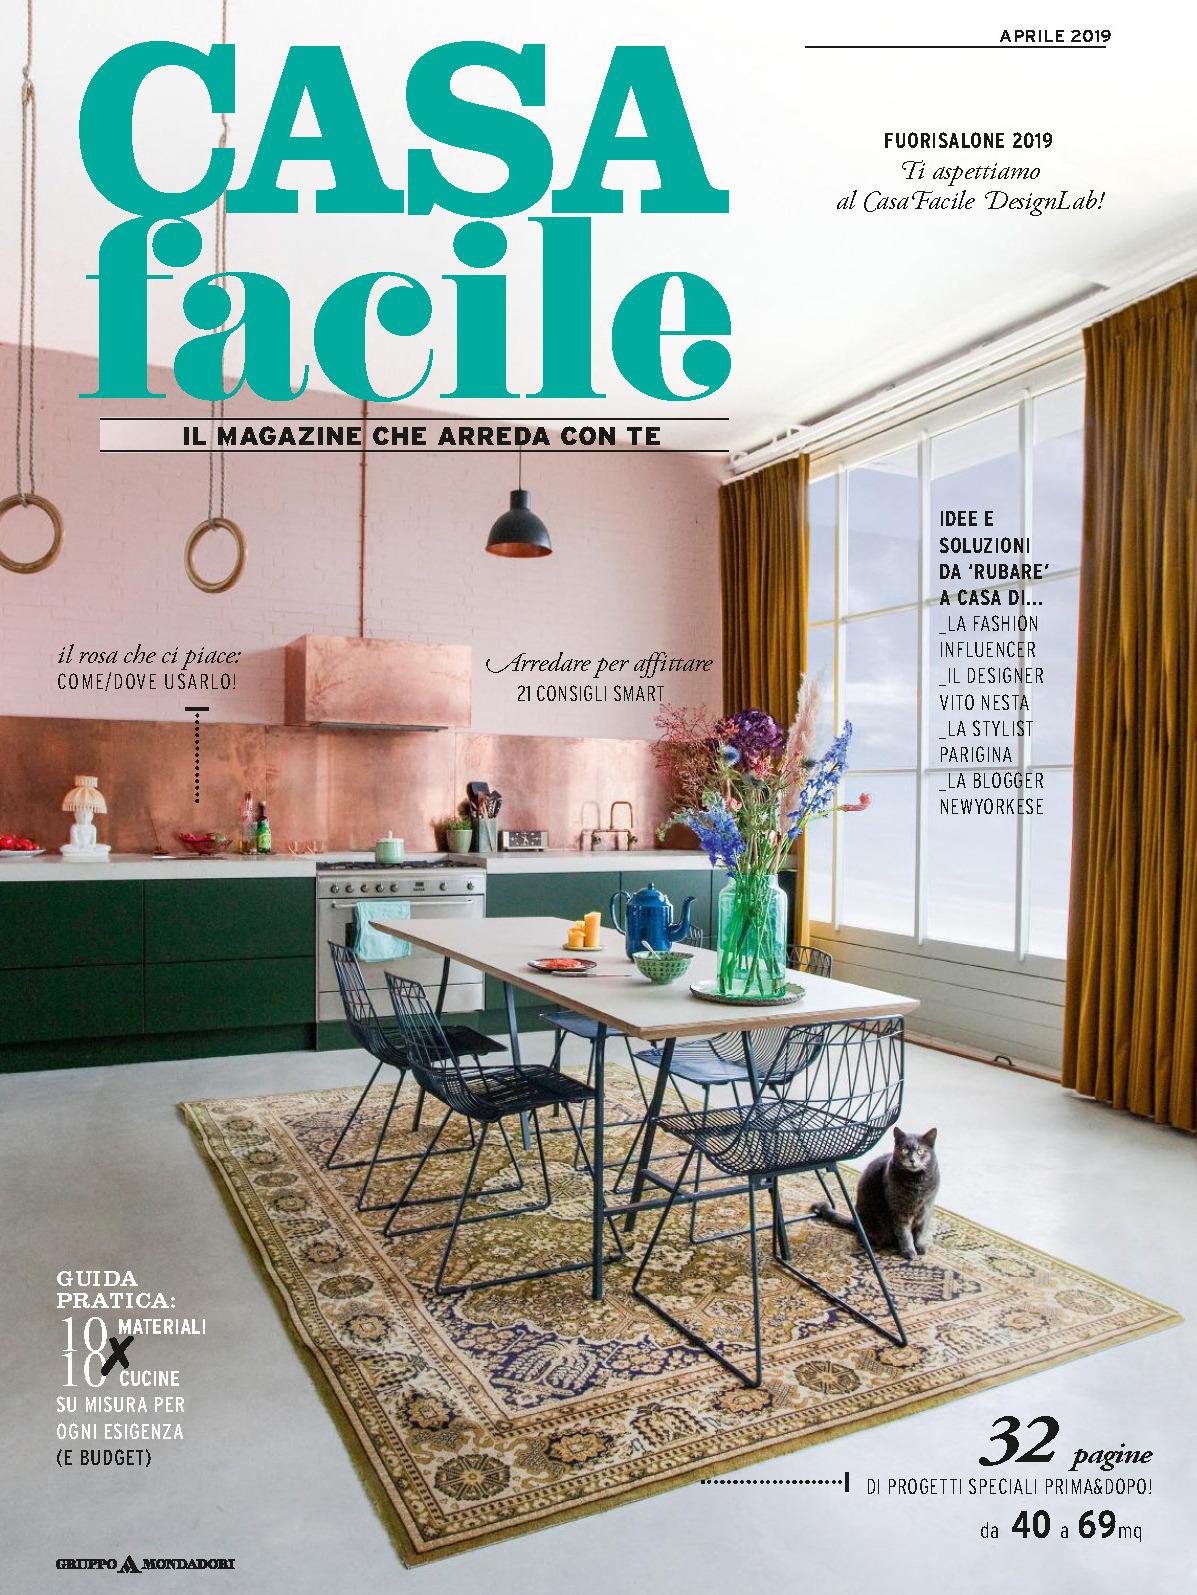 《Casa Facile》意大利家居空间装饰艺术杂志2019年04月号